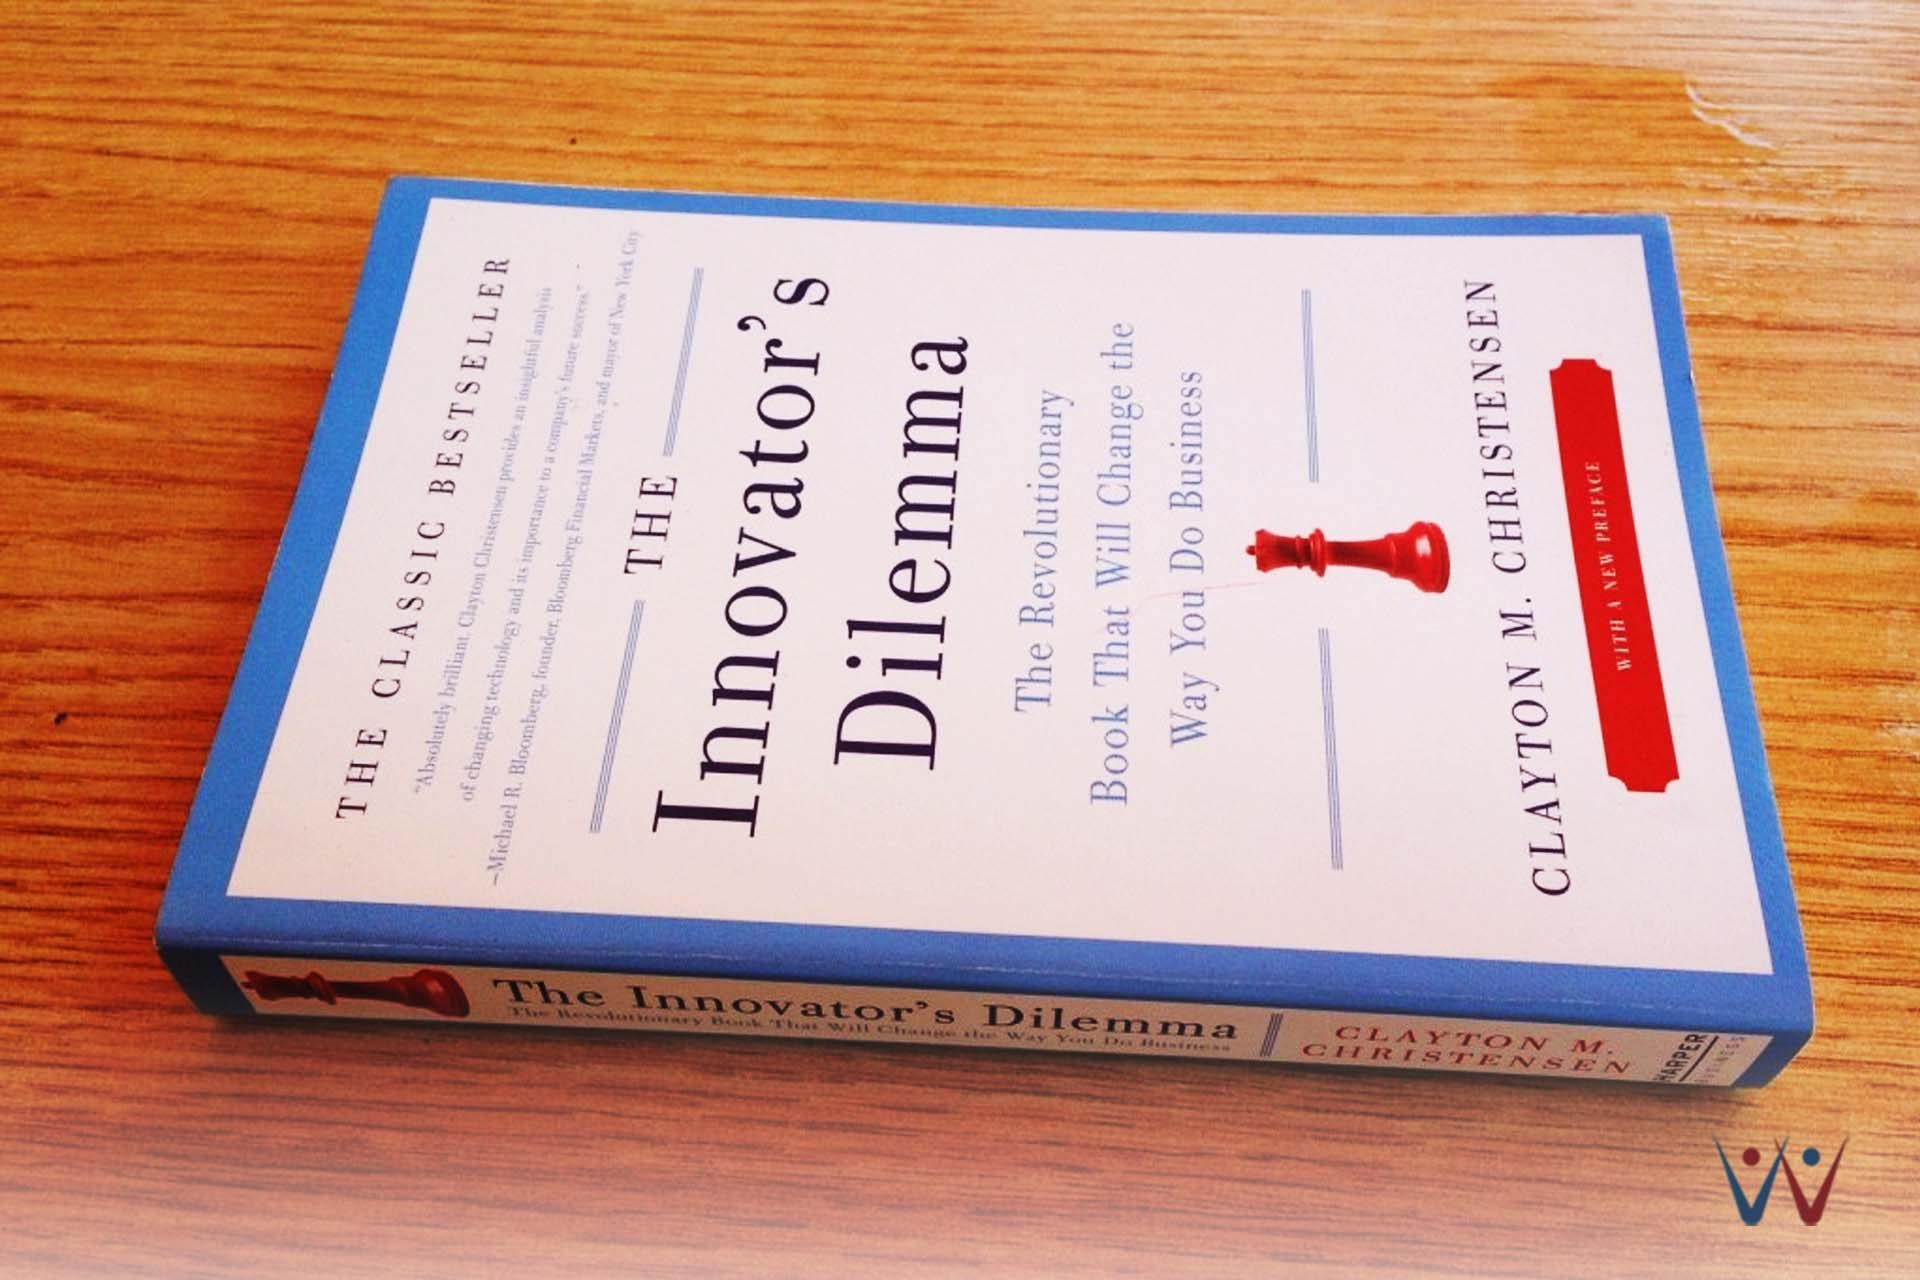 buku favorit steve jobs - the innovator's dilemma